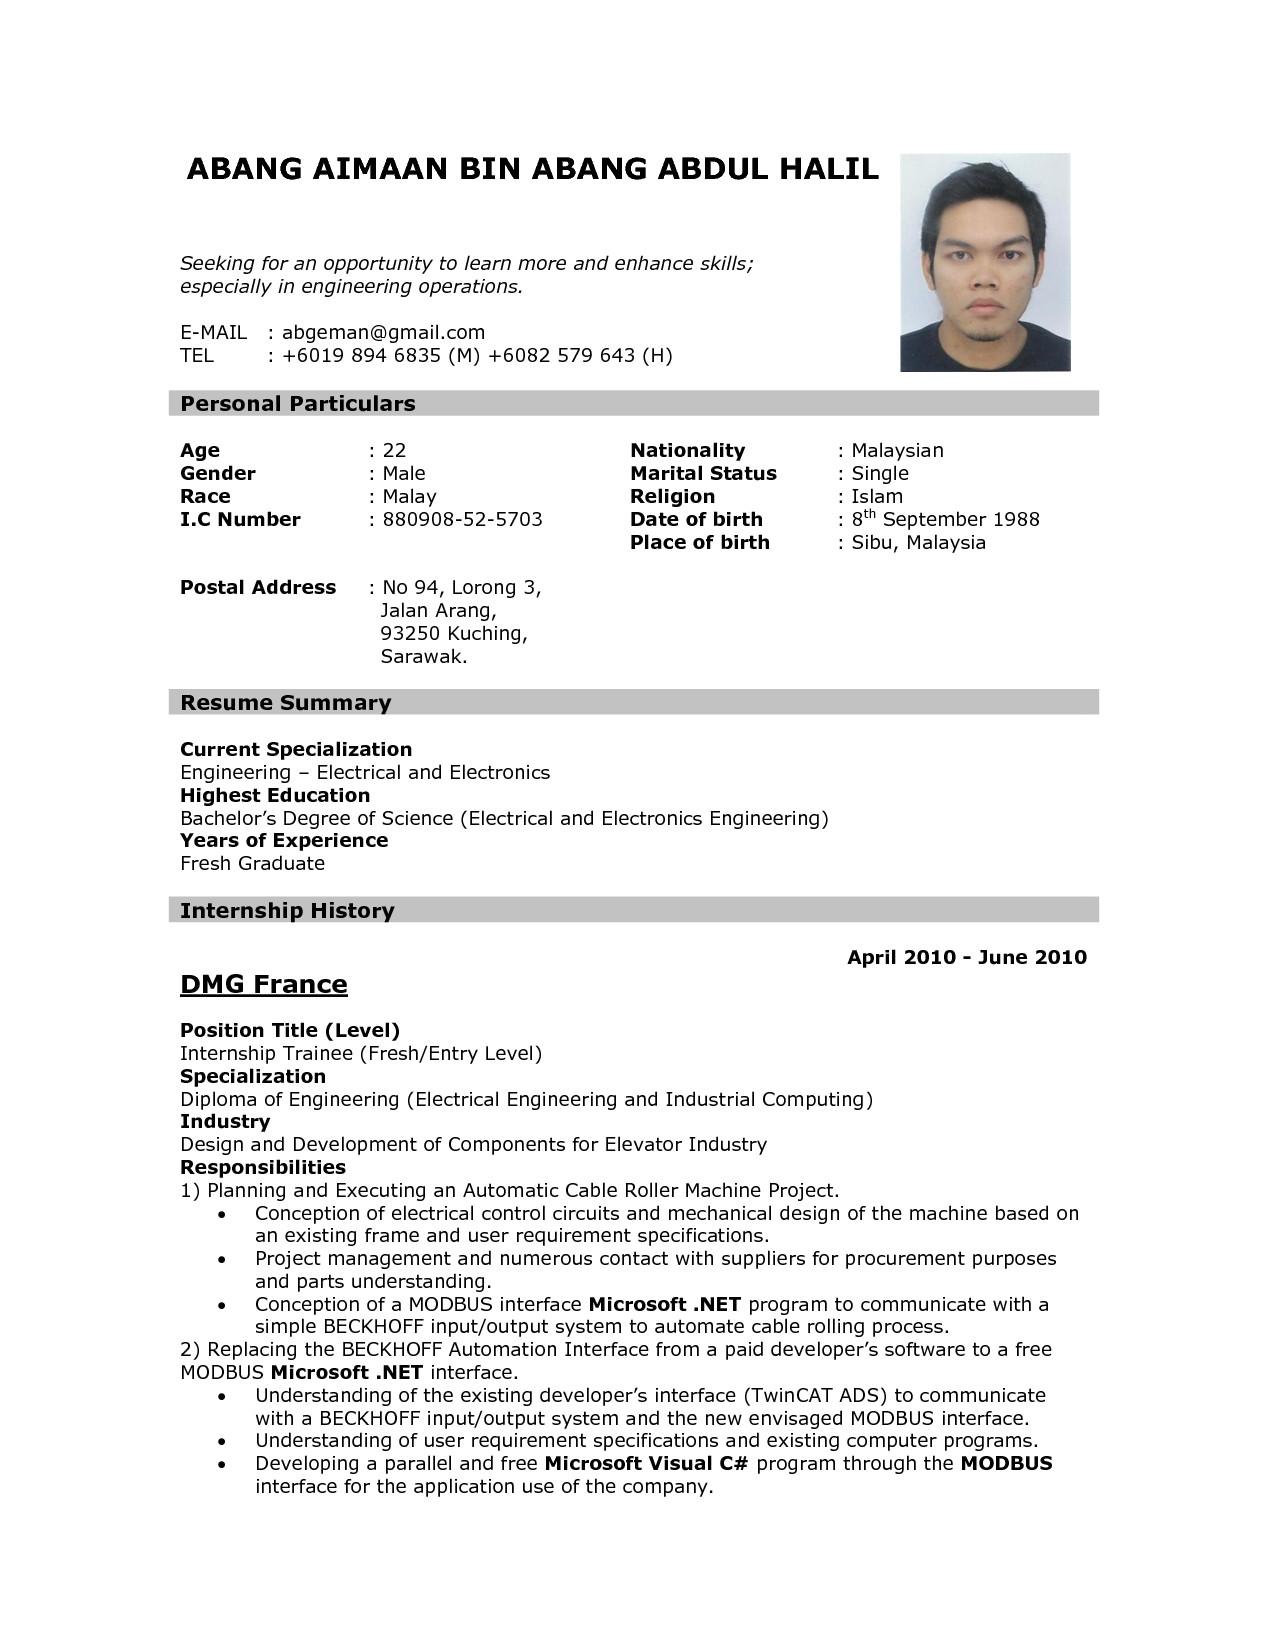 How to Spell Resume for Job Application | williamson-ga.us